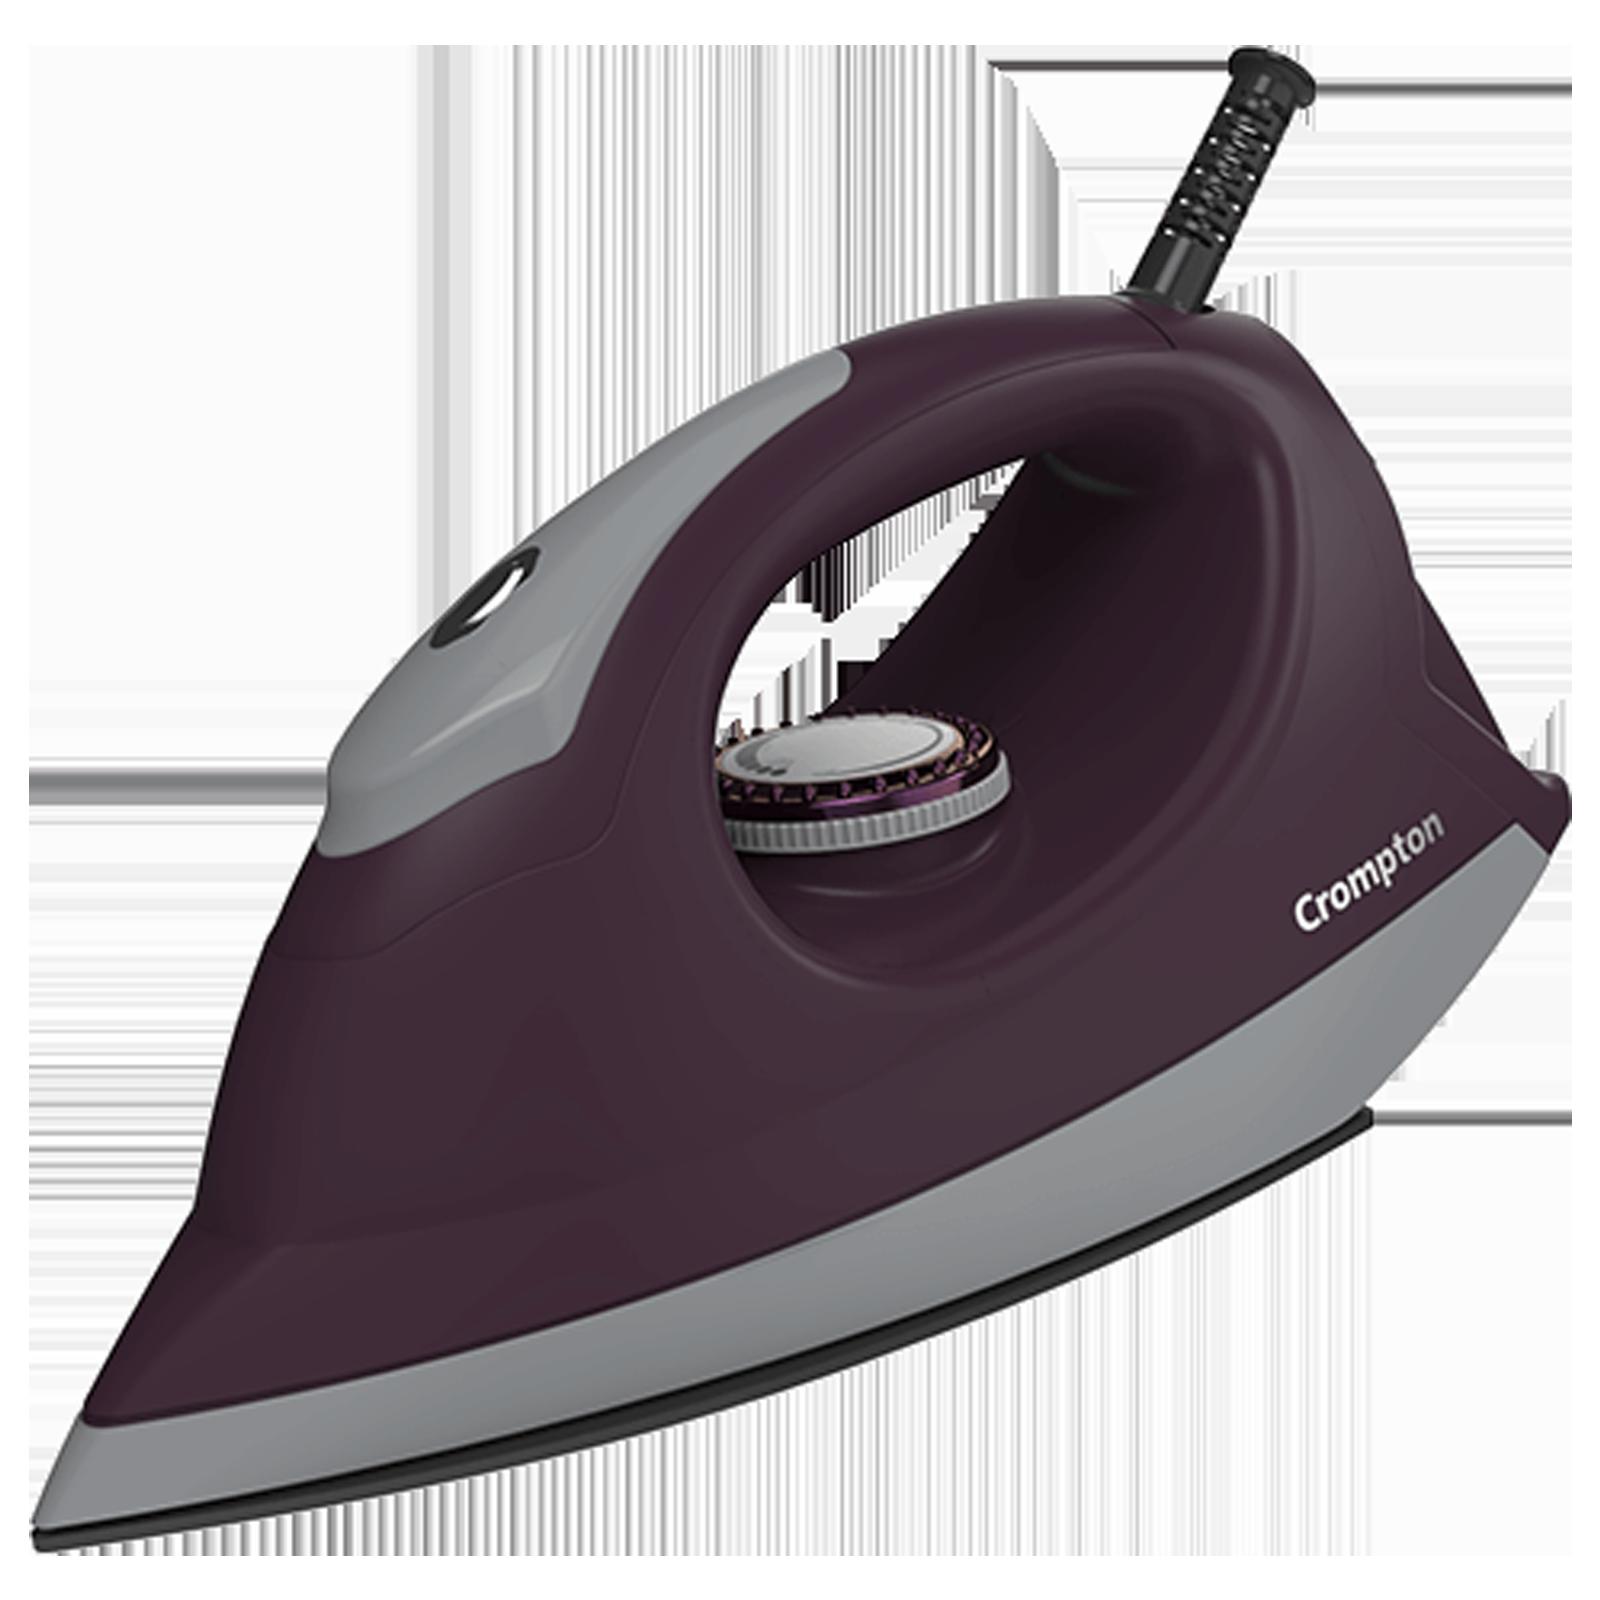 Crompton Pebble 1100 Watts Dry Iron (6 Fabric Settings, ACGEI-PEBBLE, Purple)